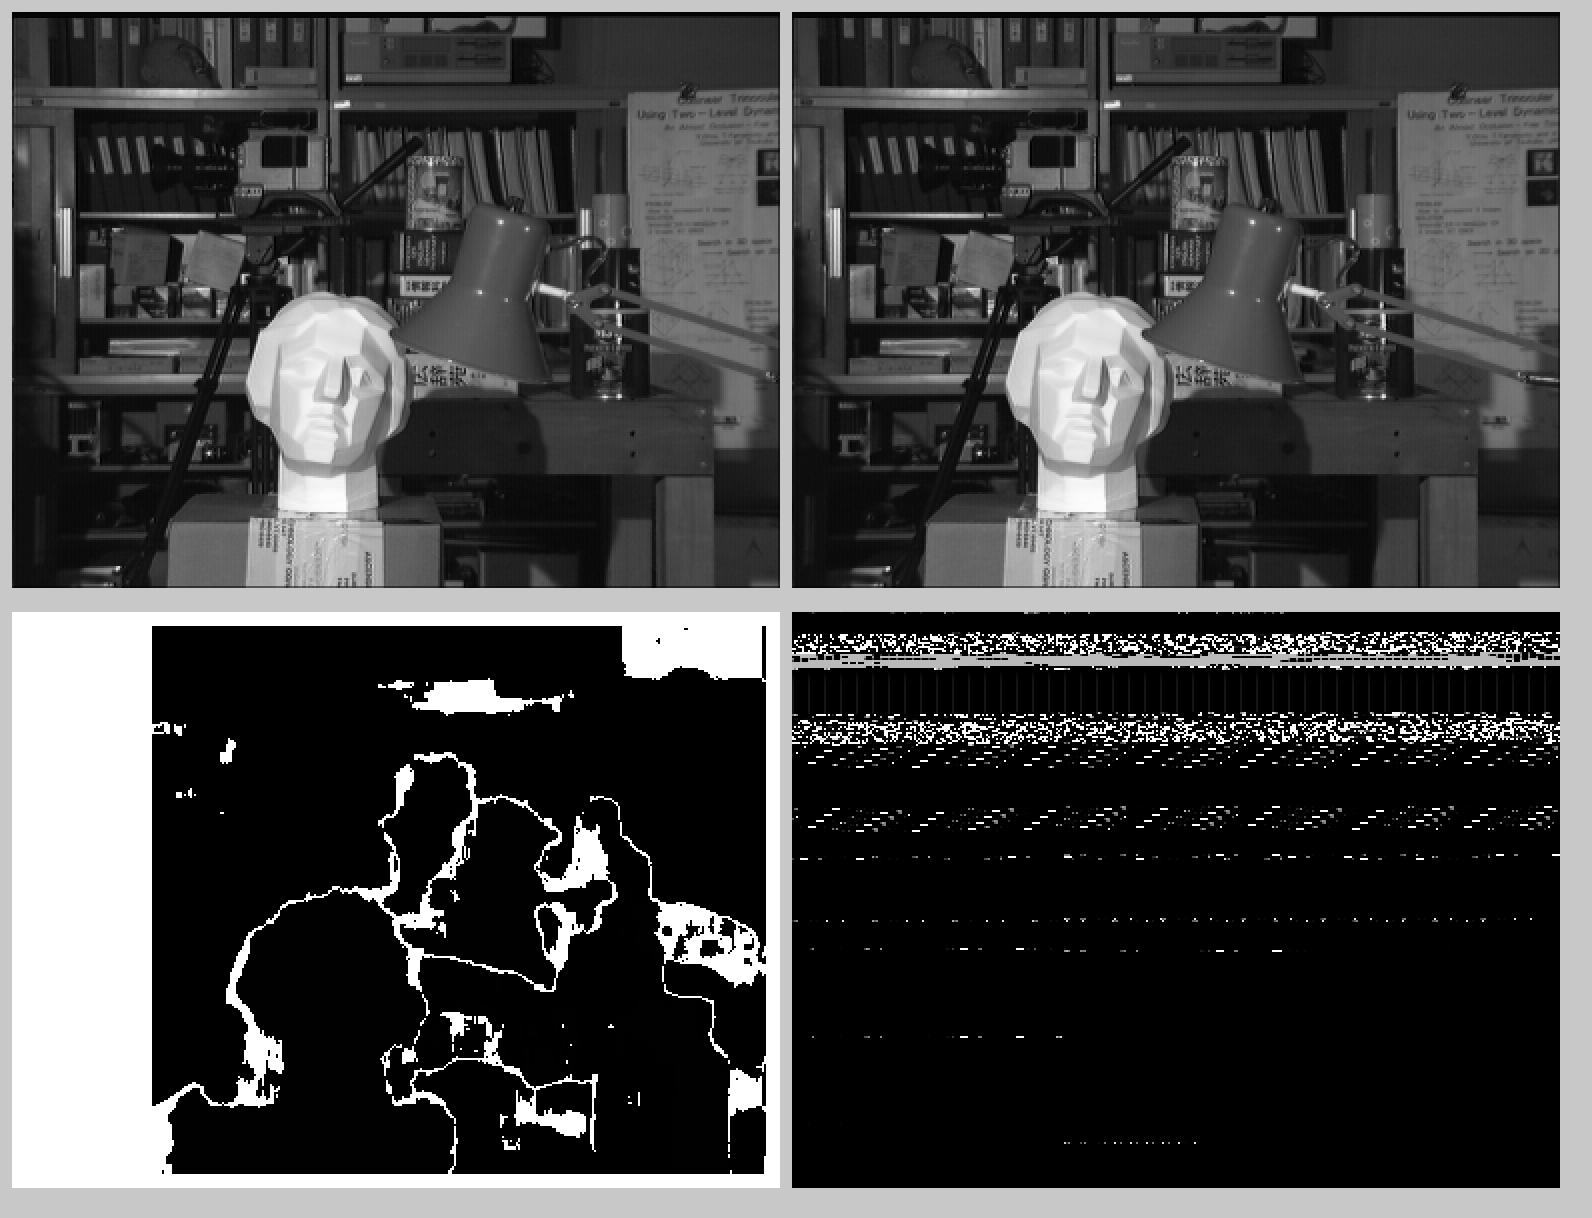 openCV and stereoBM - help with image bit depth translation problem